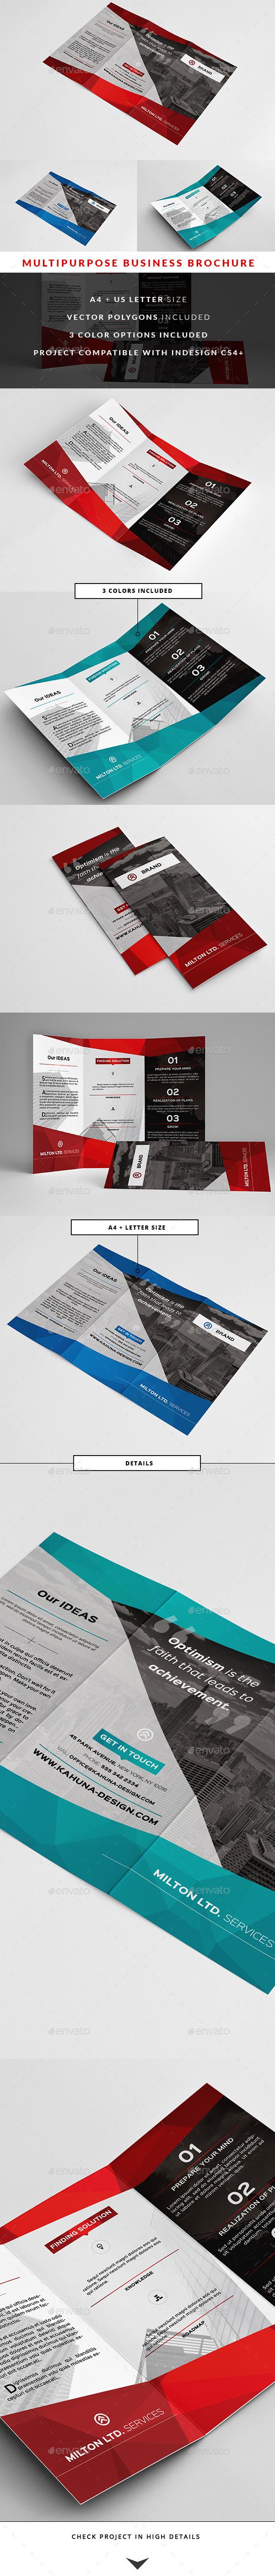 Multipurpose Business Brochure 2 - Corporate Brochures